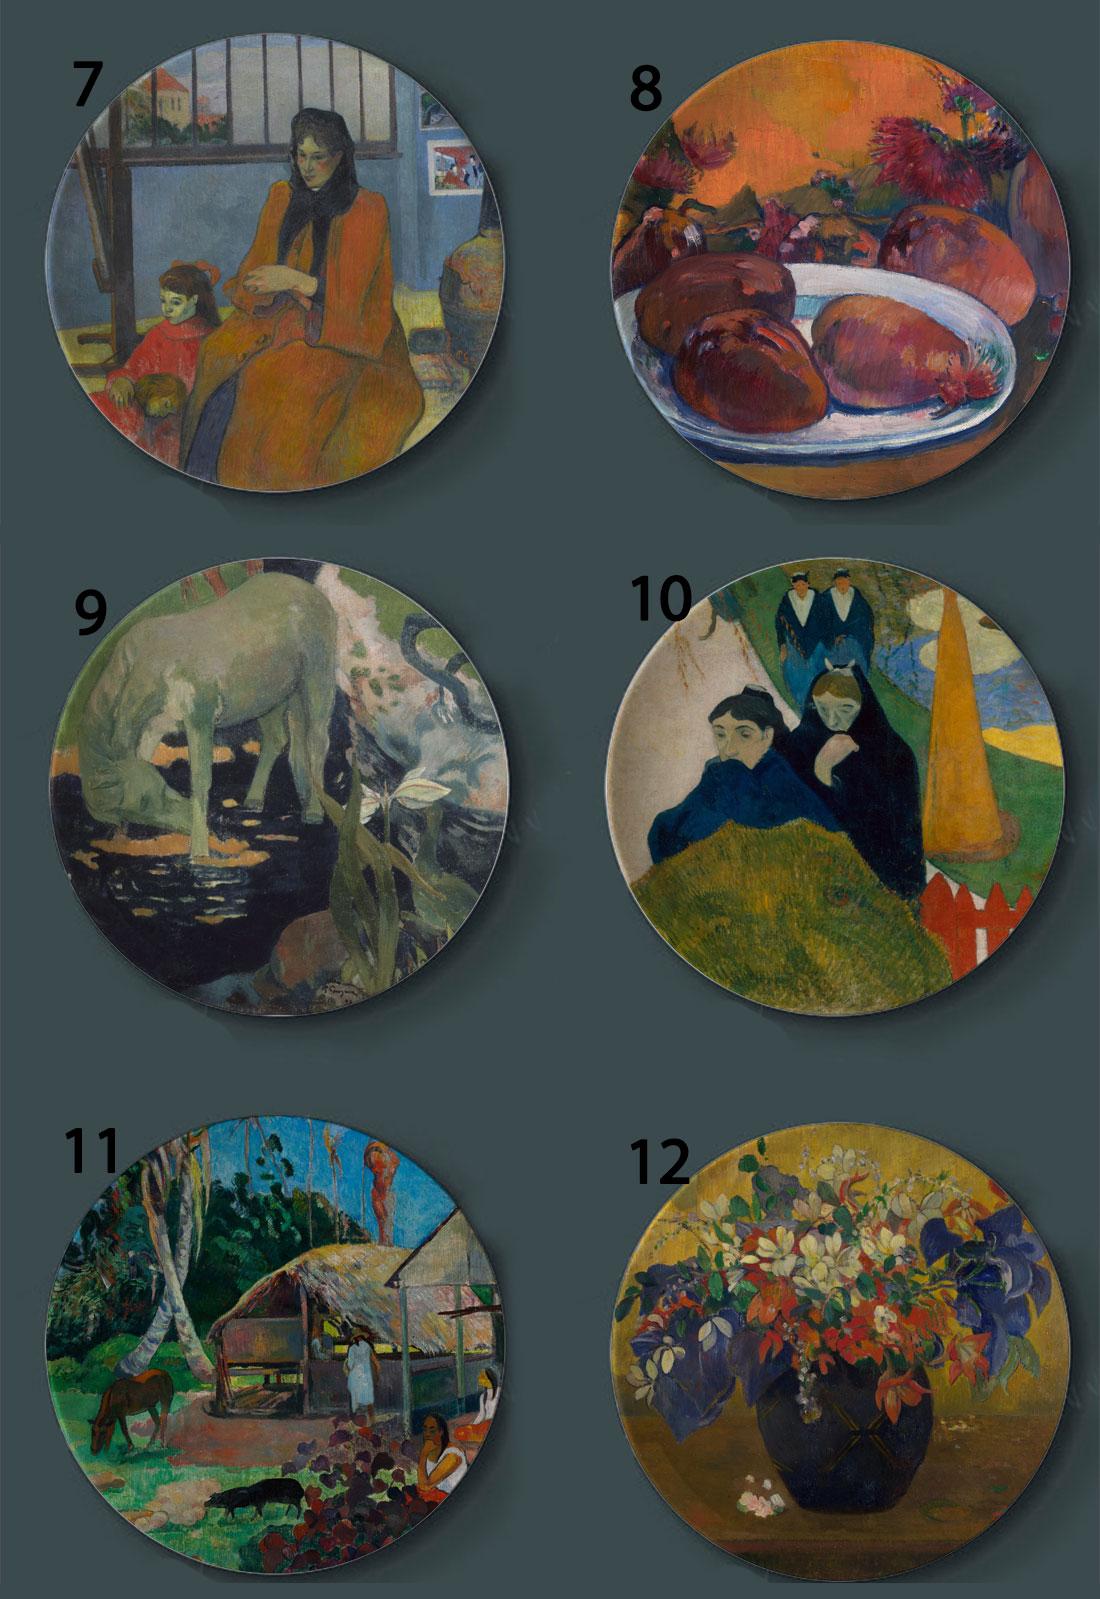 Gauguin Wall Decorative Ceramic Plates Cosiness Shop